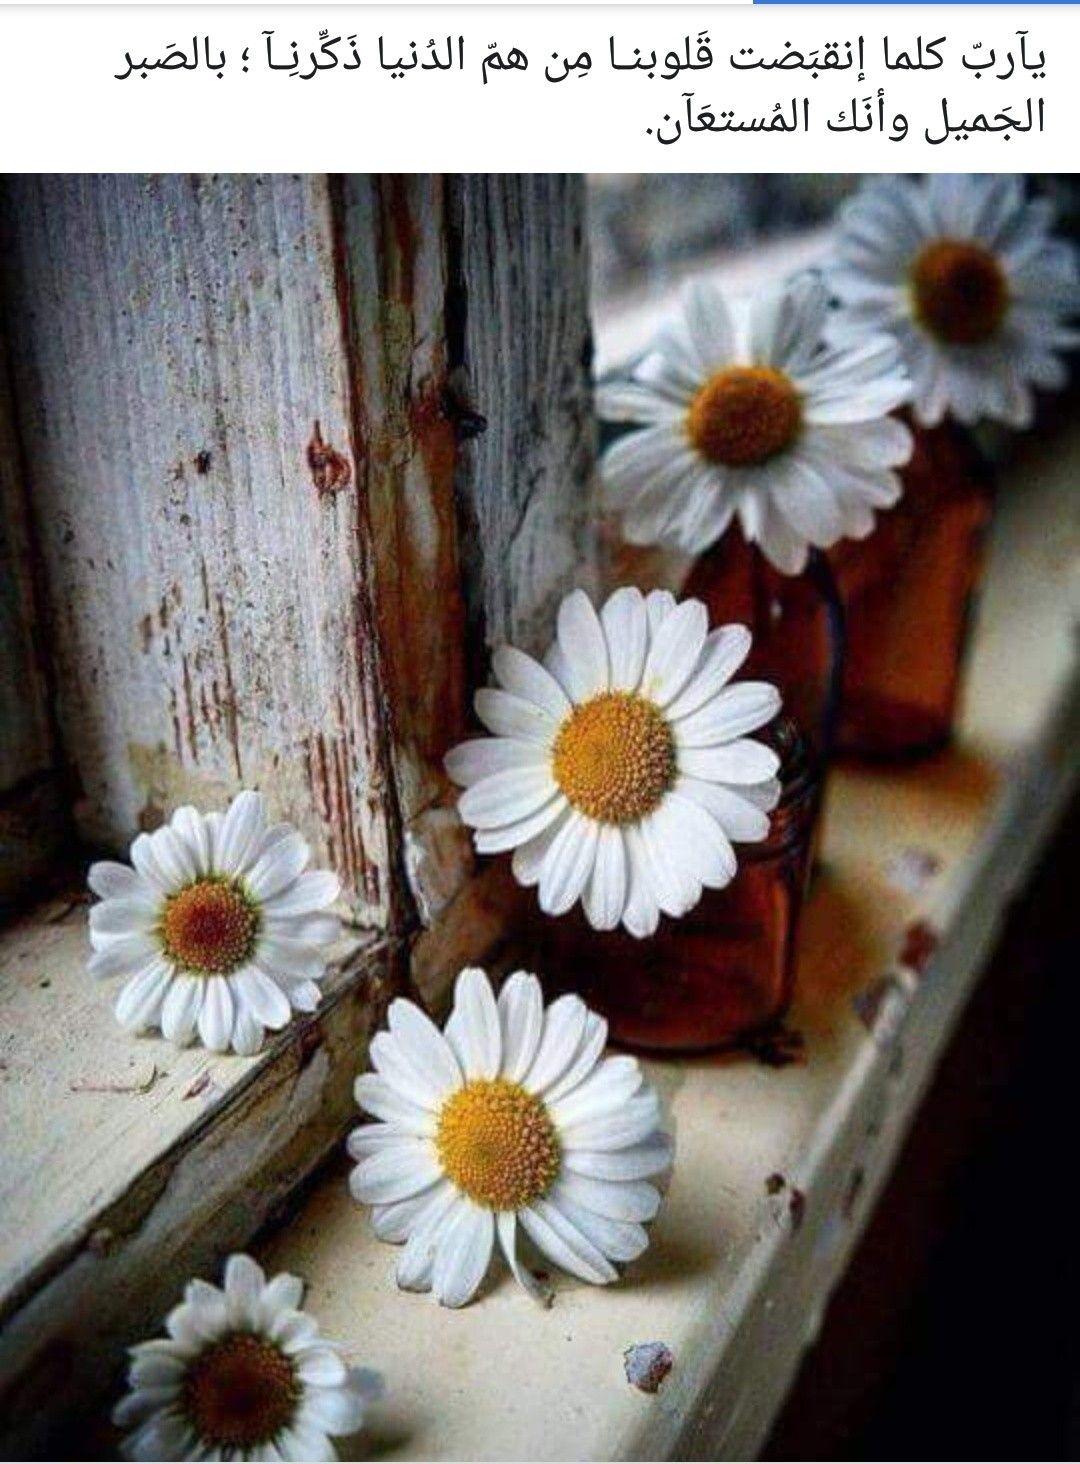 ادعيه image by Zooz Happy flowers, Sunflowers and